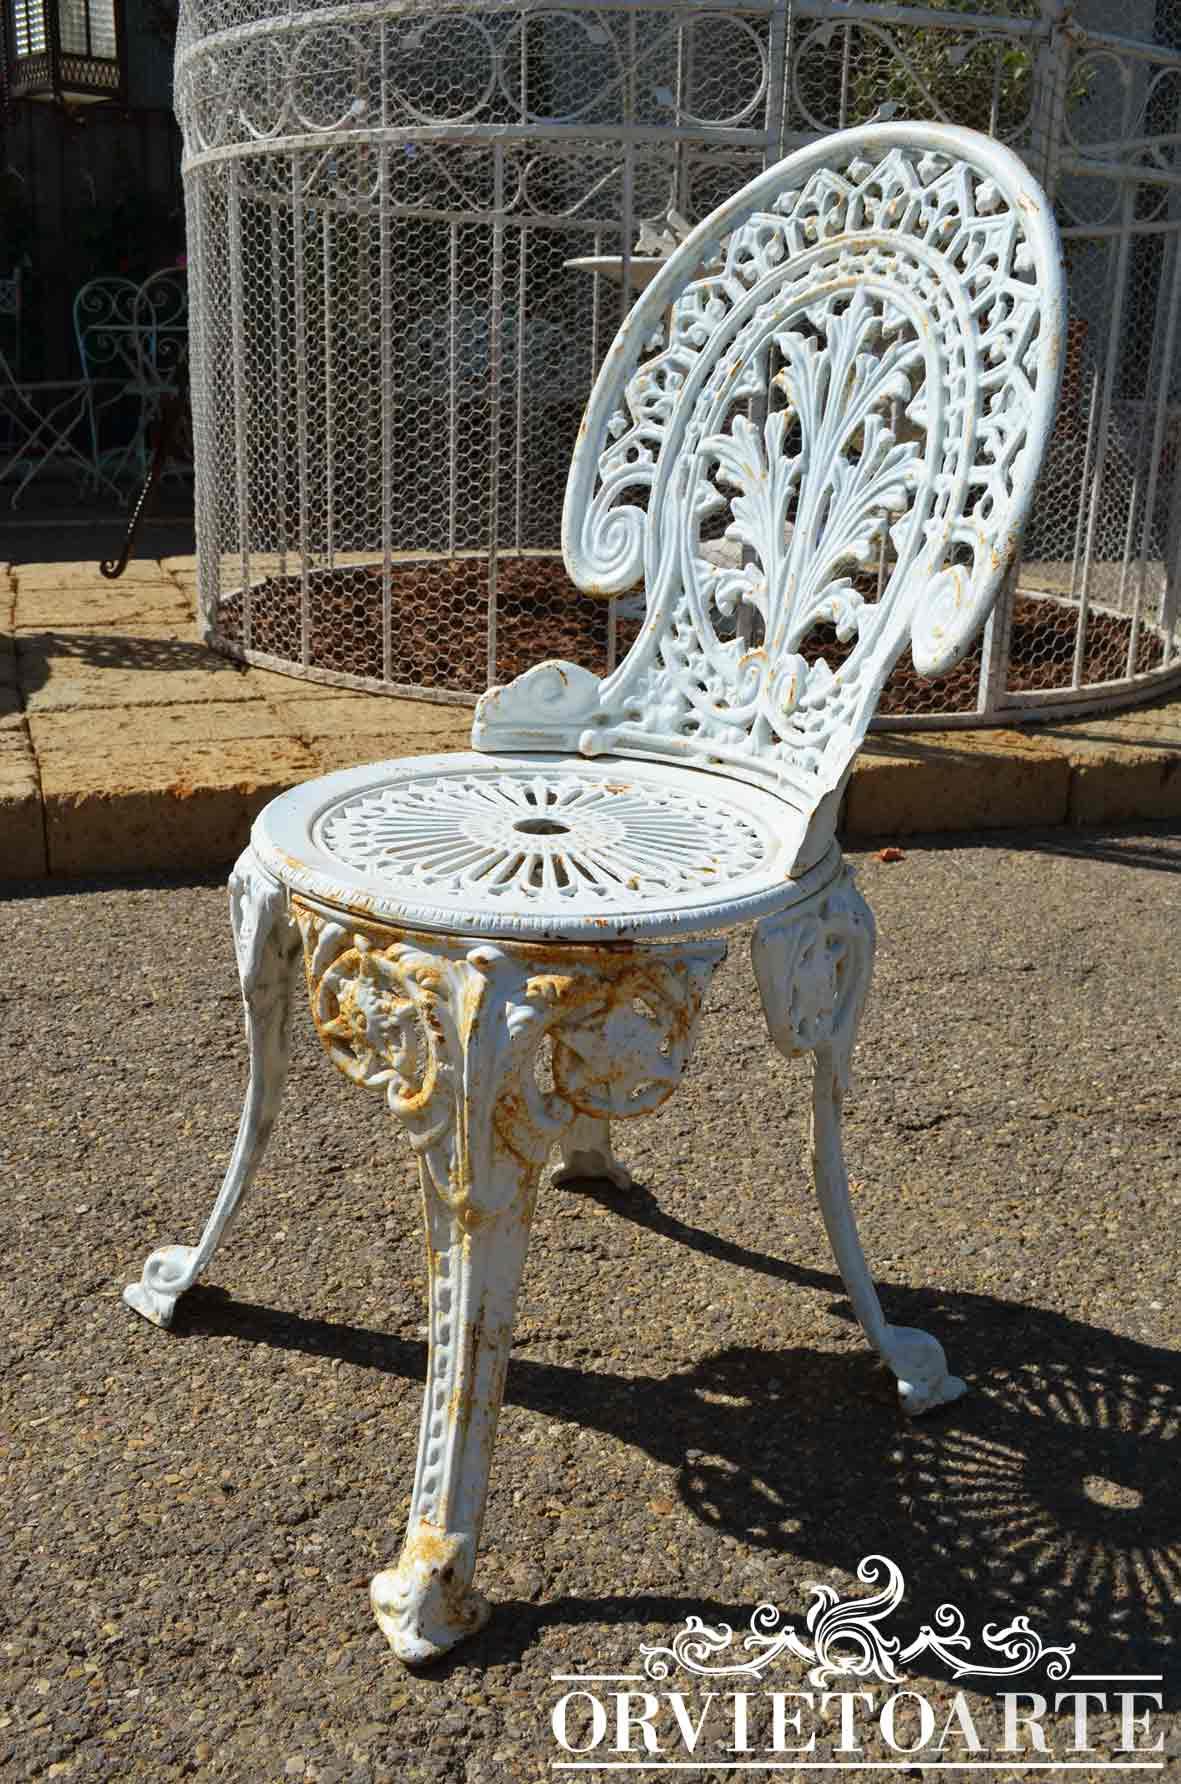 Sedie In Ghisa Da Giardino Prezzi.Orvieto Arte Sedia In Ghisa Di Vecchia Fattura